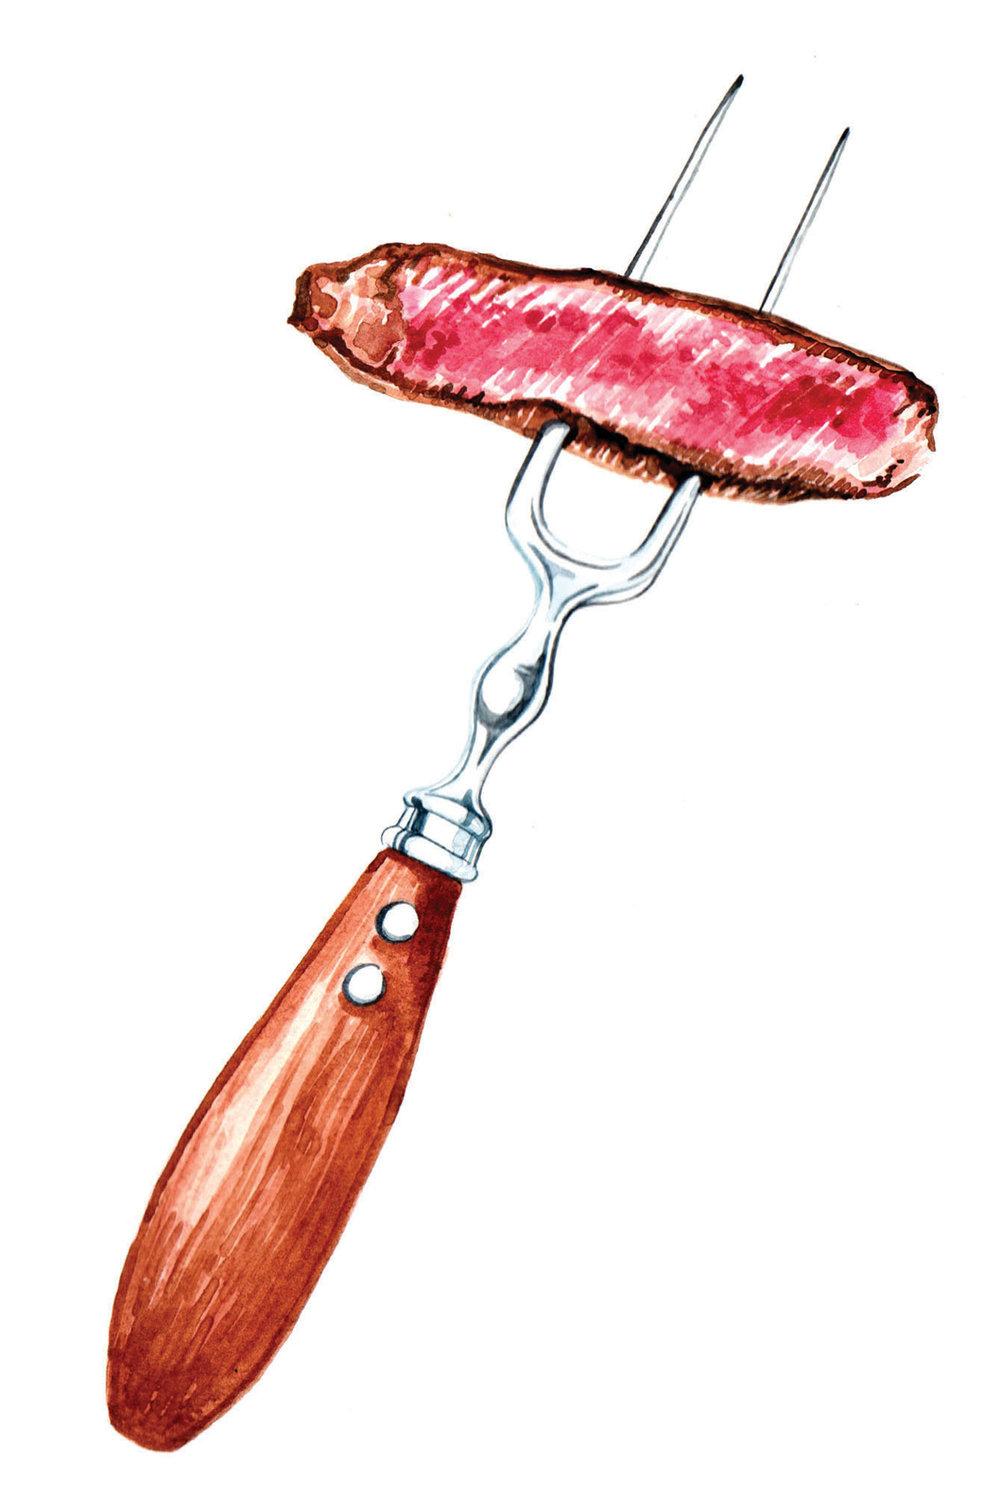 watercolour food illustrations steak on fork